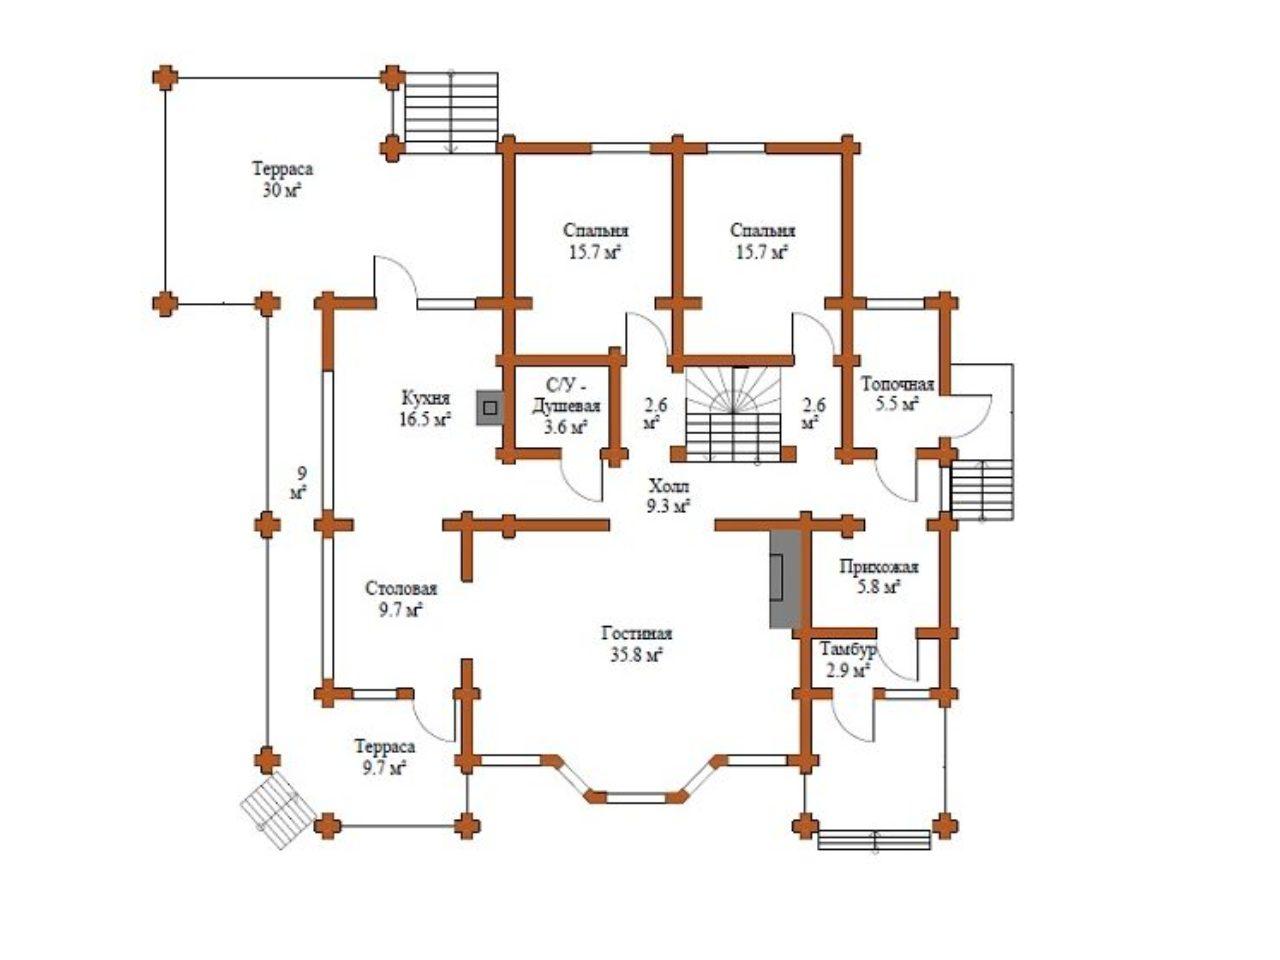 plan-1-etazha-1000x560